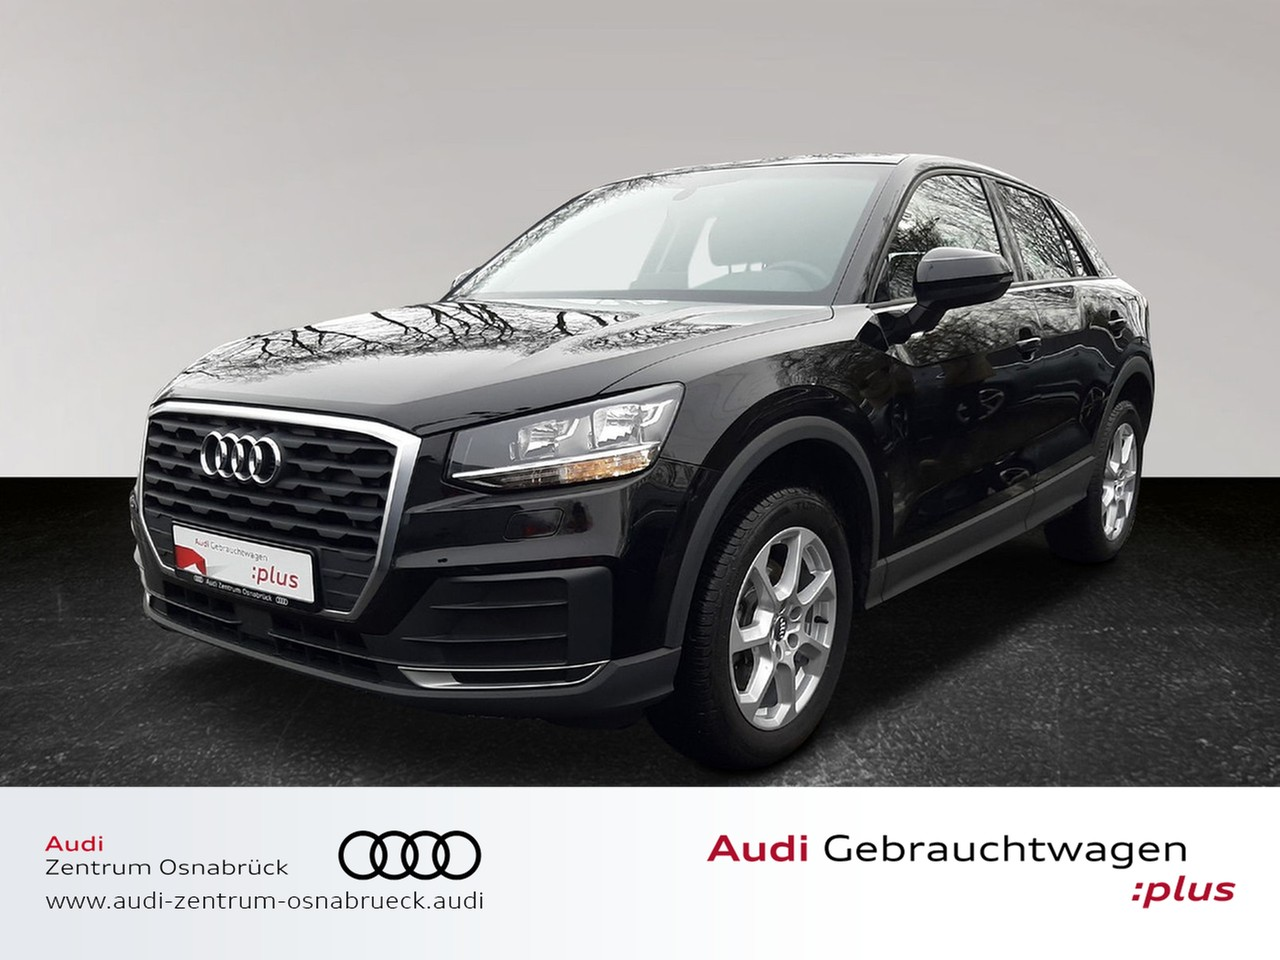 Audi Q2 1.6 TDI Navi VirtualCP Pano SHZ APS Technology Selection, Jahr 2018, Diesel